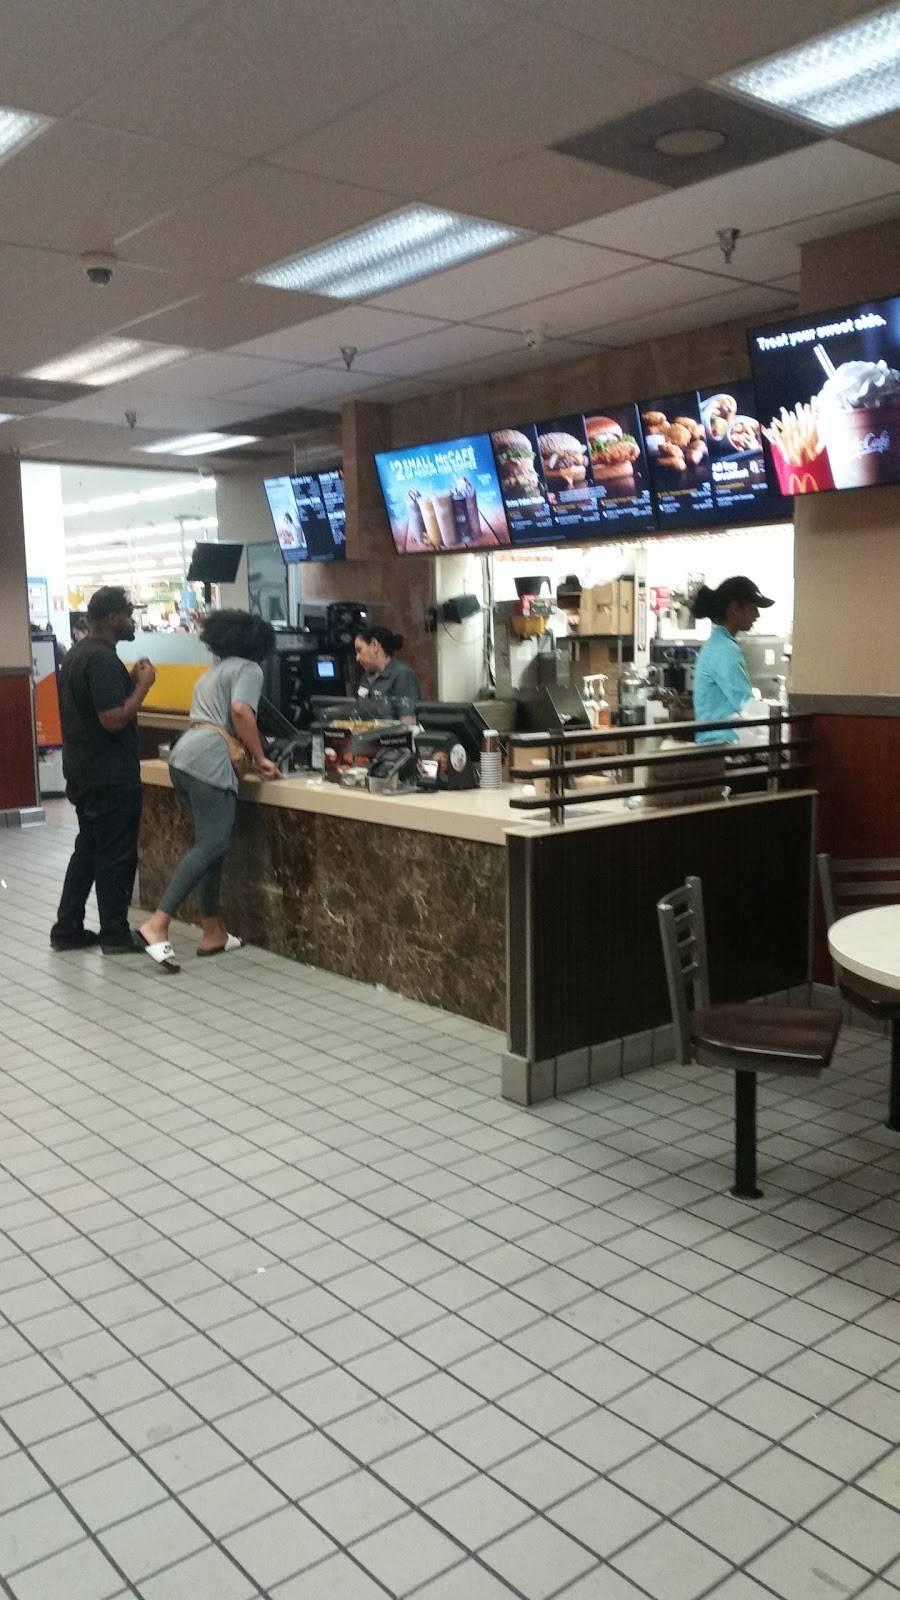 McDonalds | cafe | 440 N Euclid St, Anaheim, CA 92801, USA | 7147745845 OR +1 714-774-5845